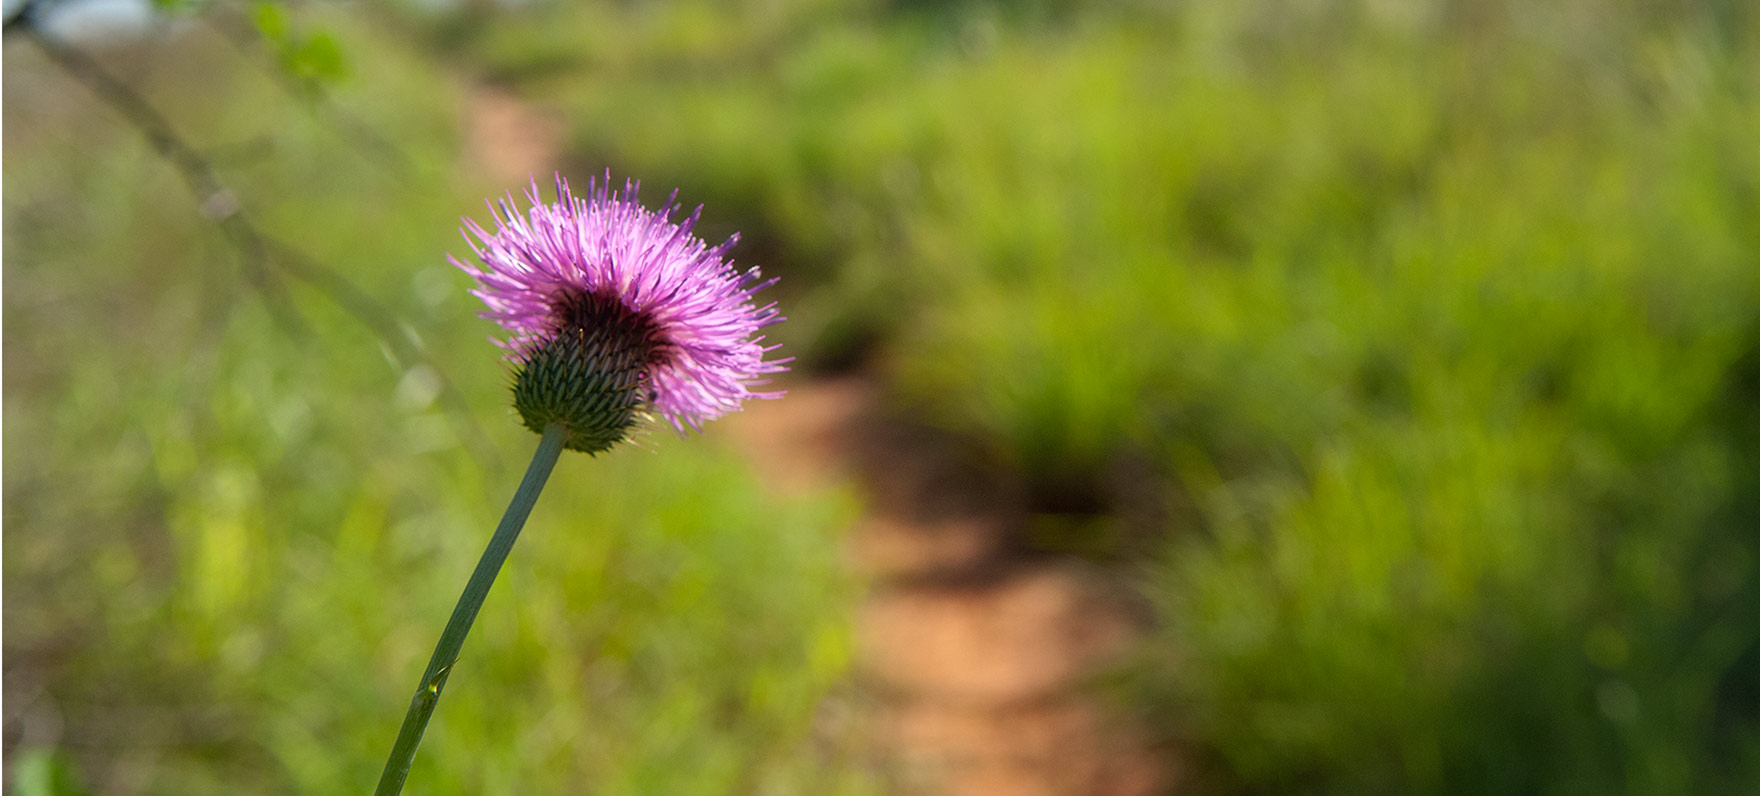 Copper Breaks State Park — Texas Parks & Wildlife Department